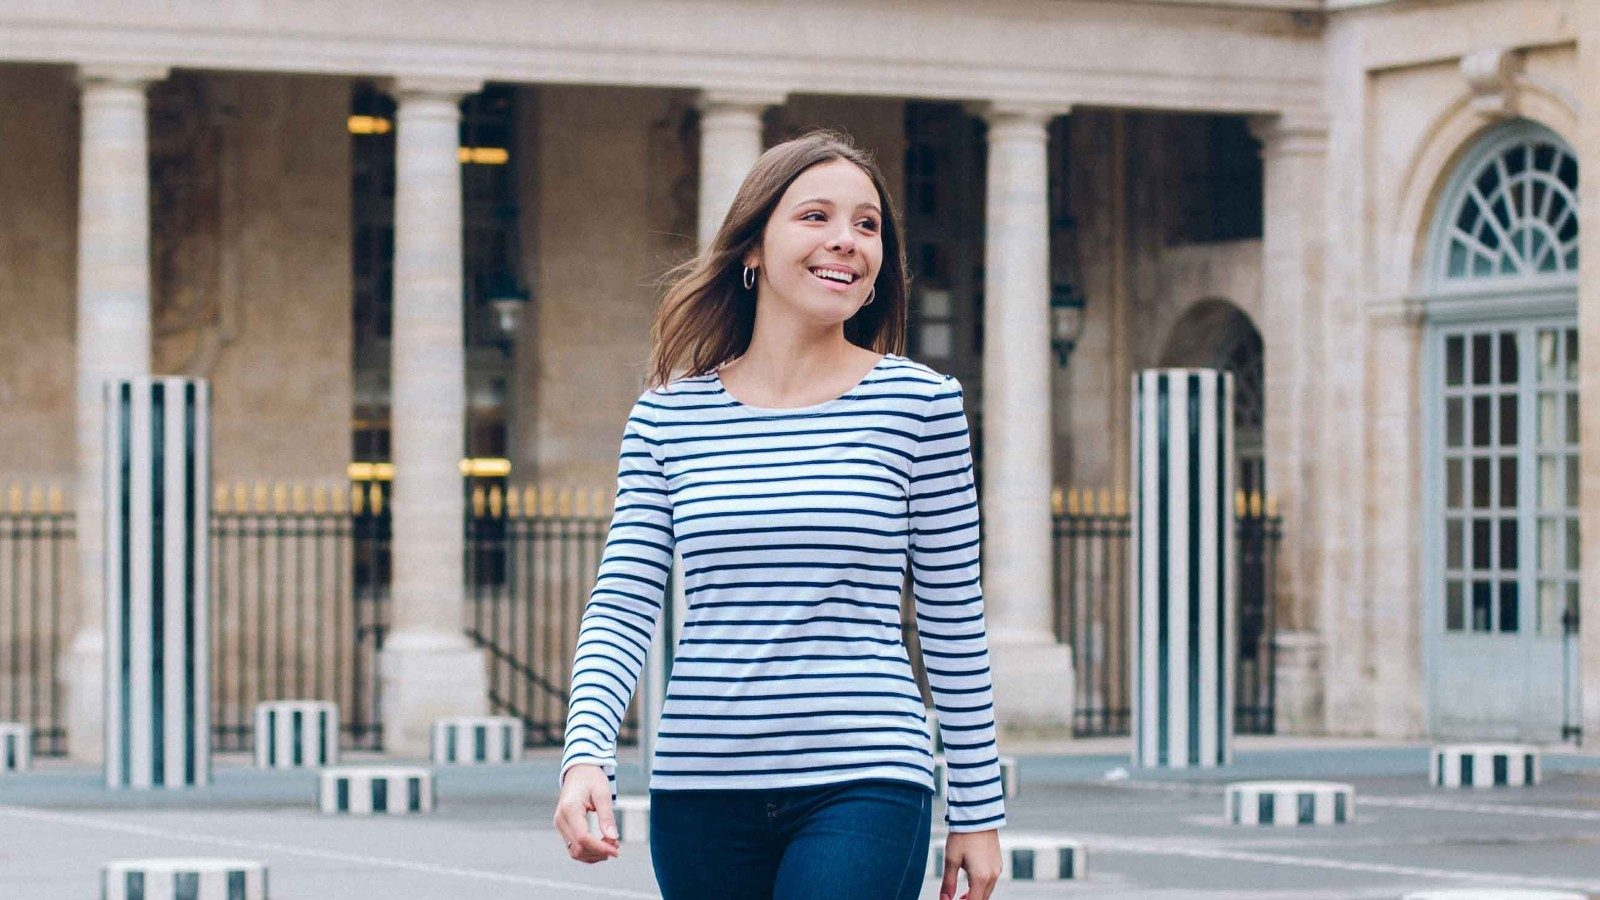 Mlle Paris Mariniere header